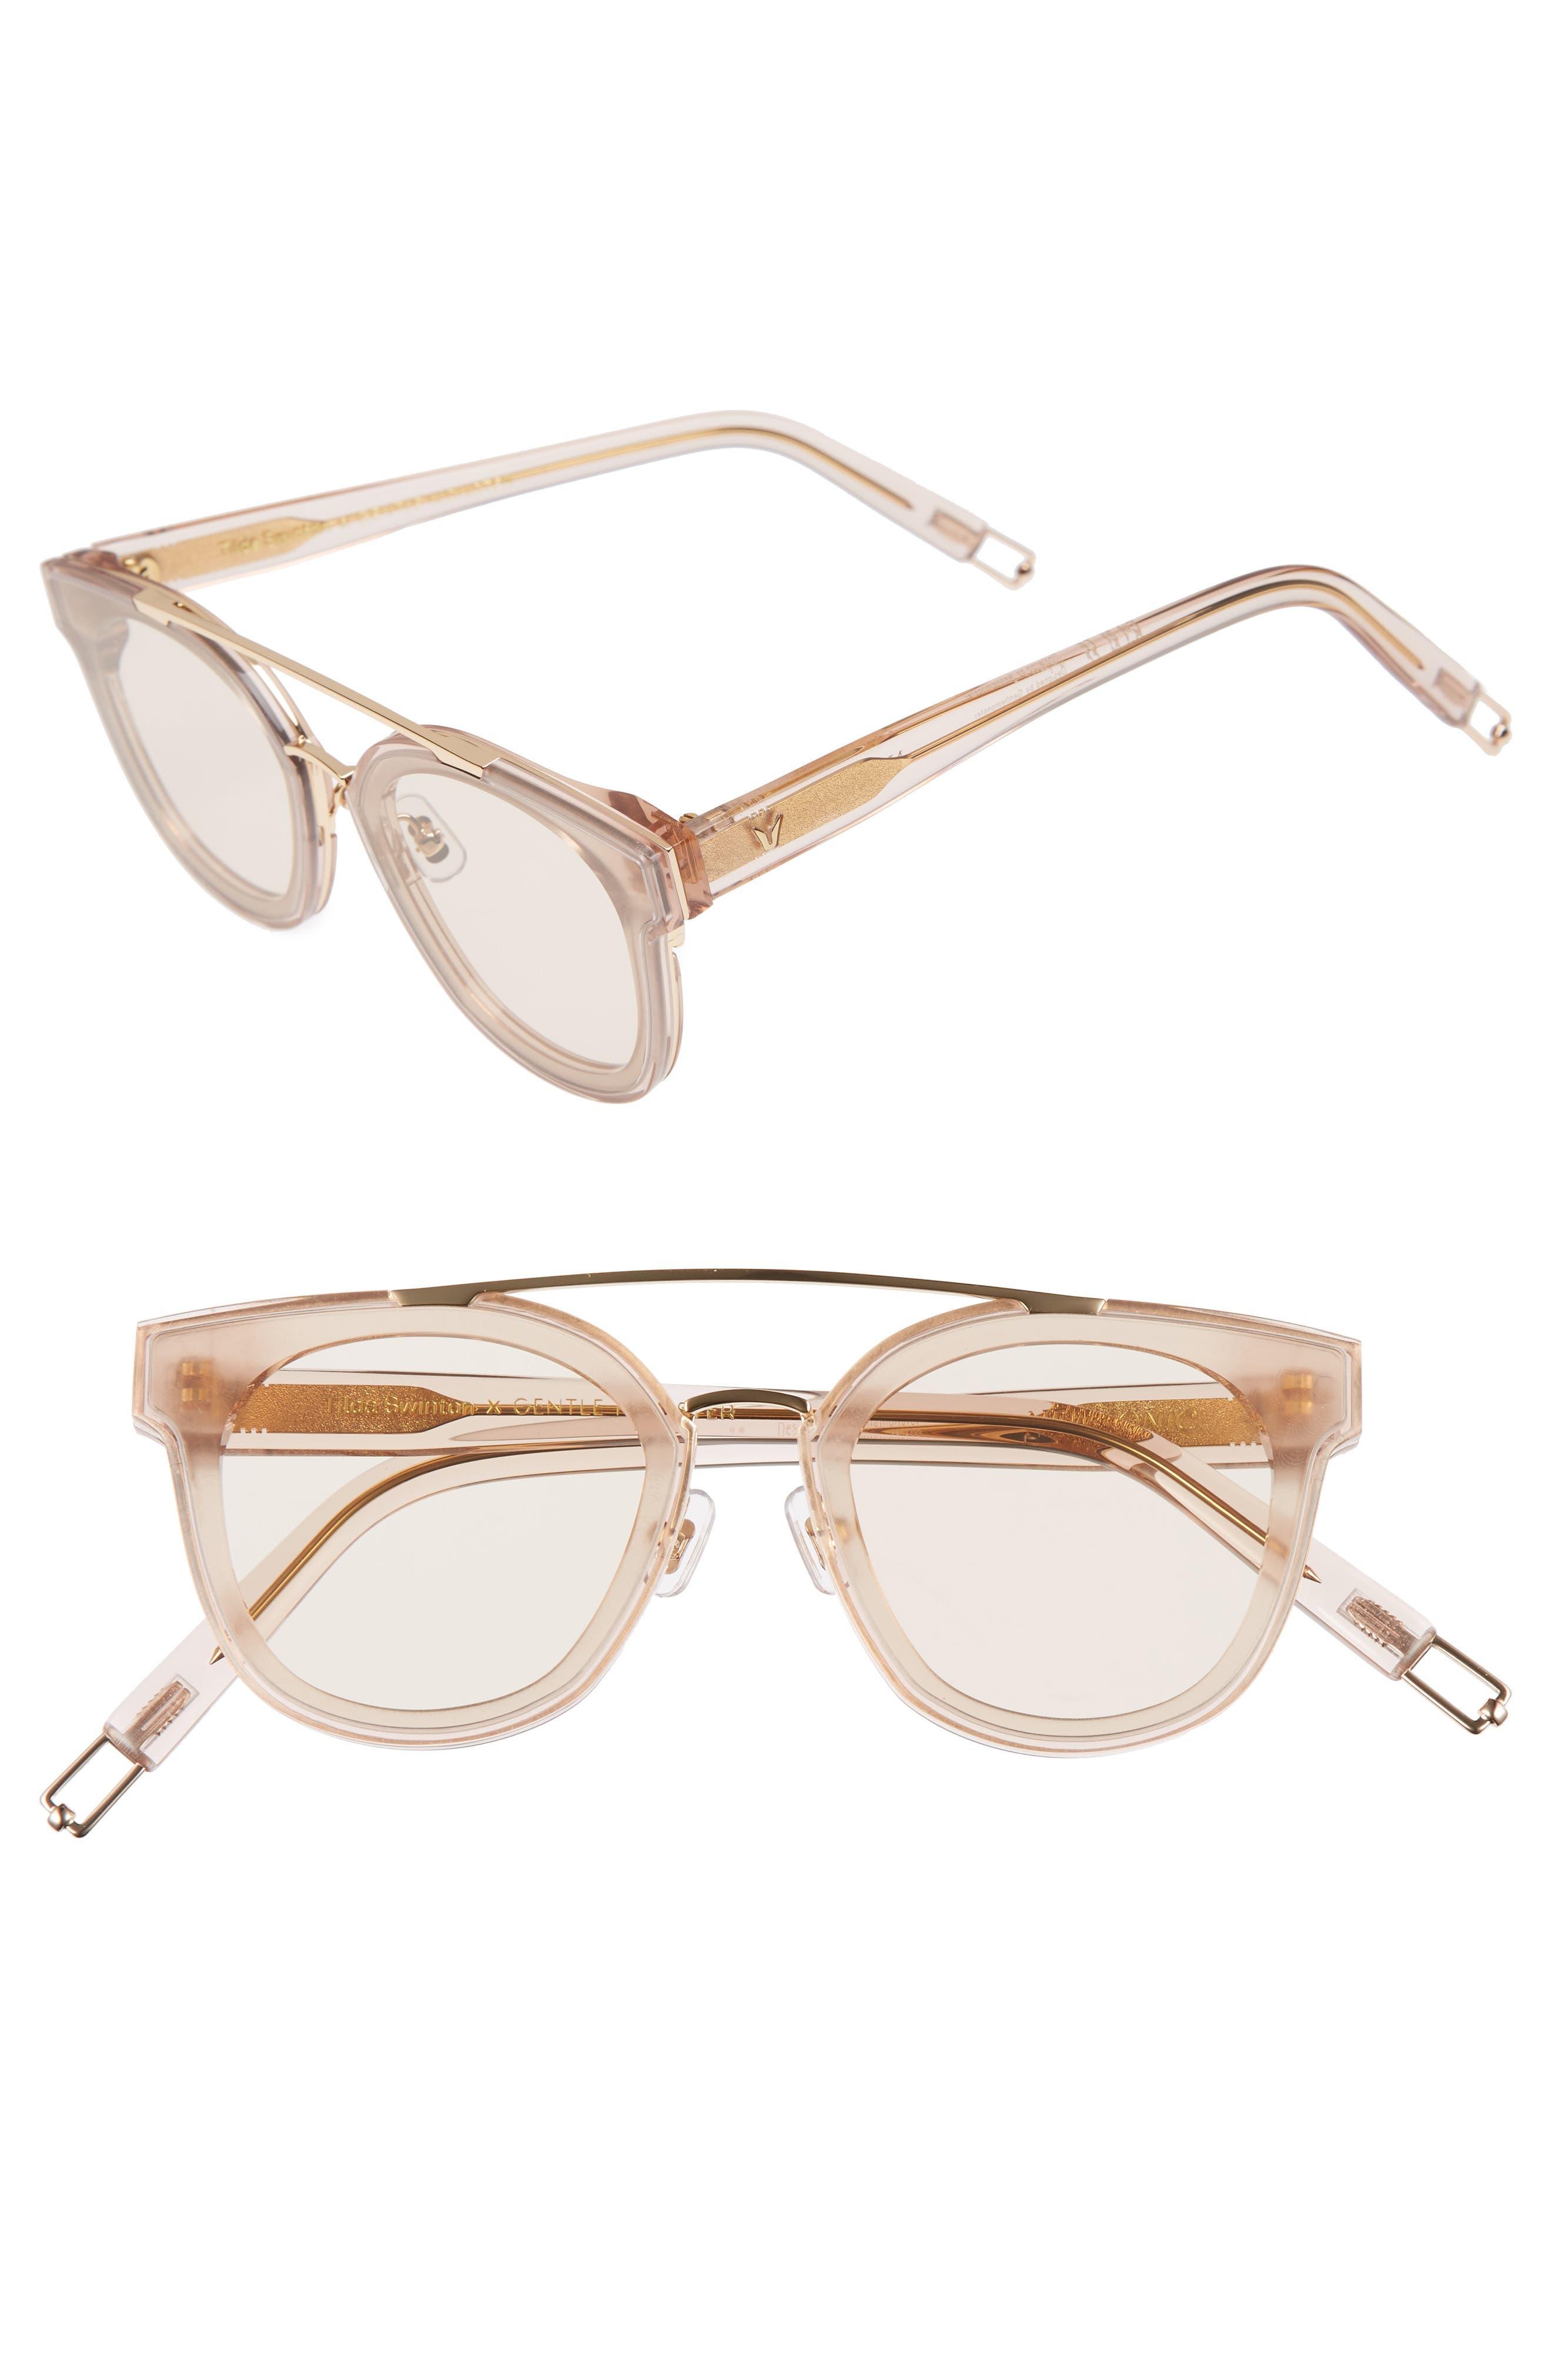 Tilda Swinton x Gentle Monster Newtonic 60mm Rounded Sunglasses